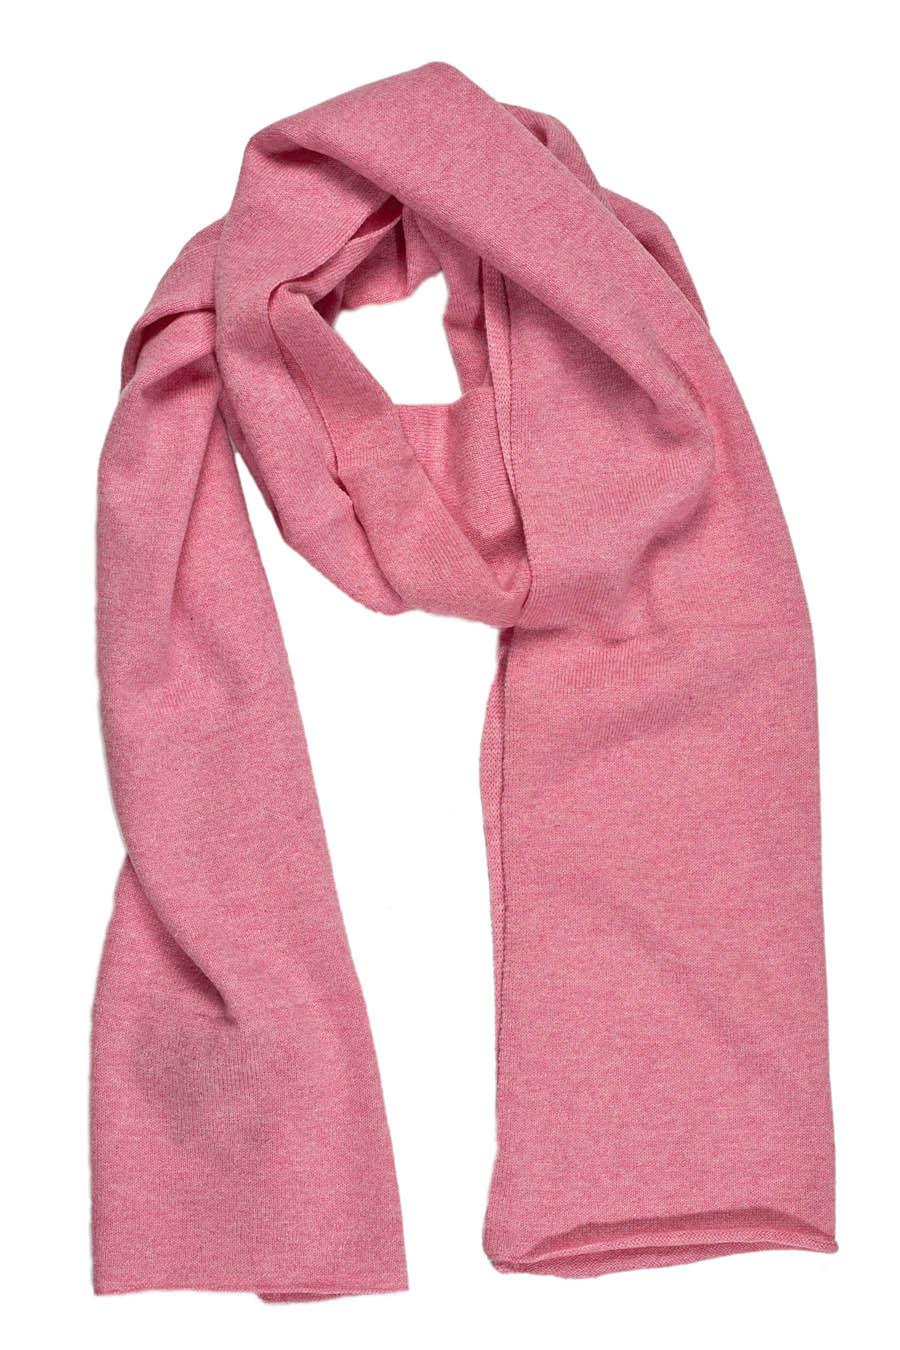 echarpe femme cachemire rose